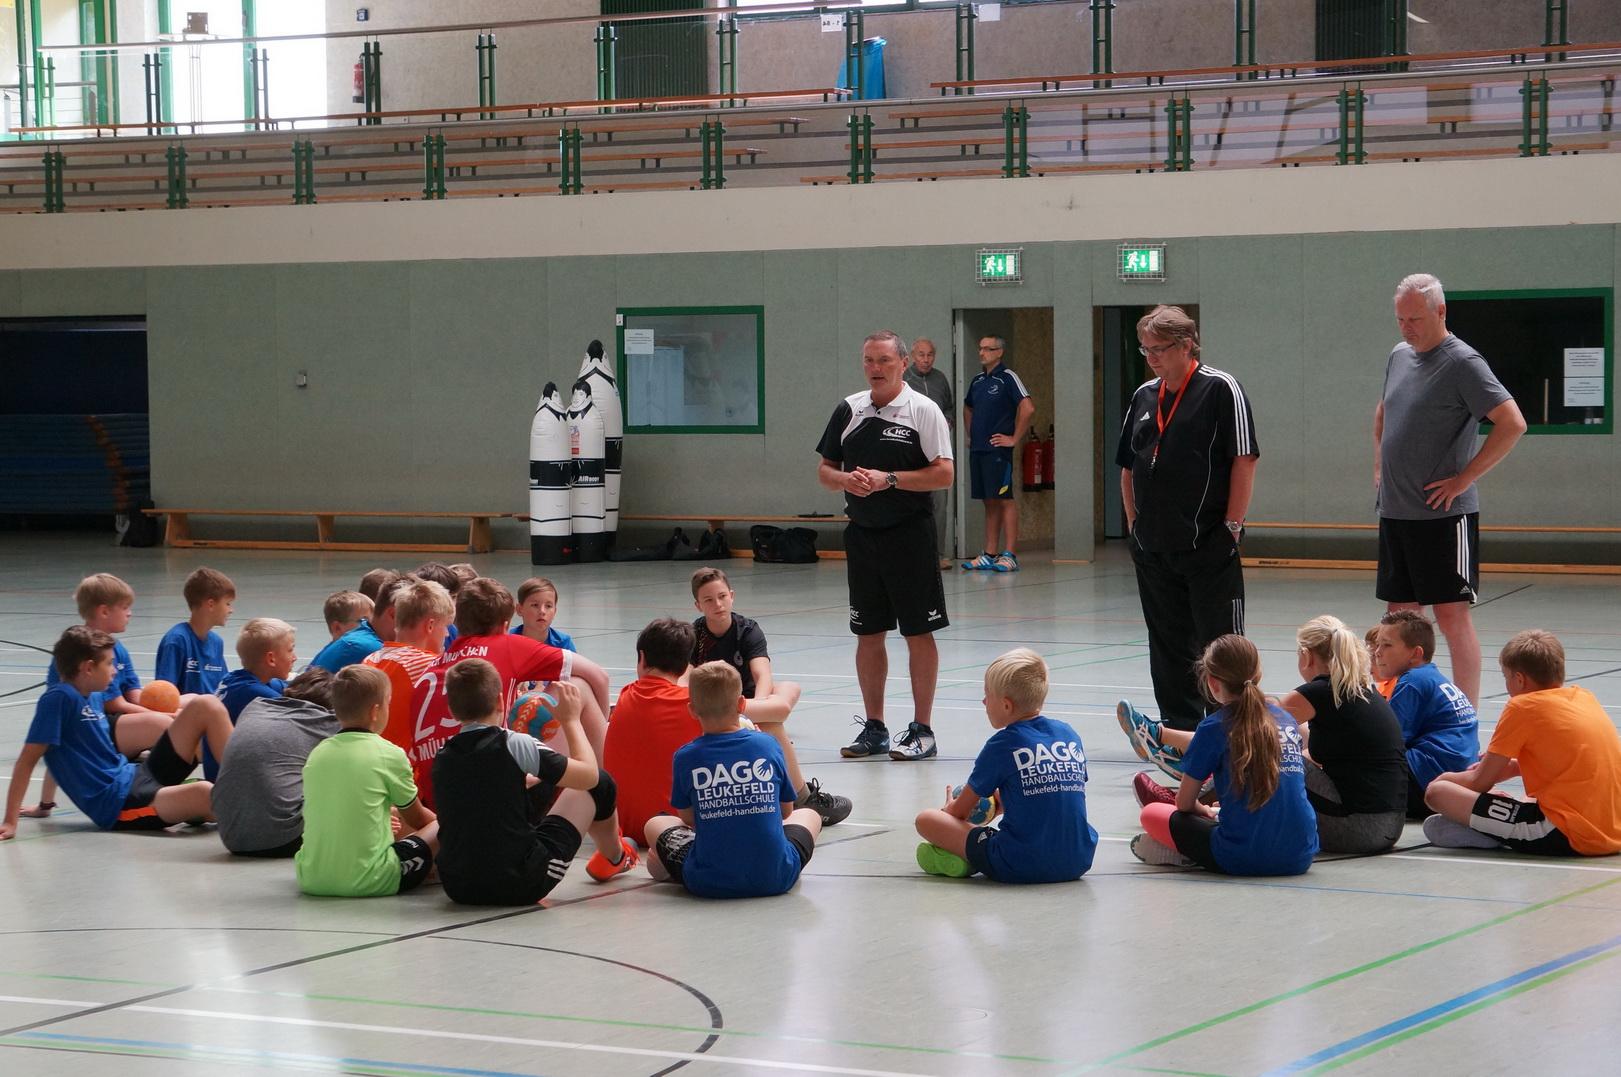 201808_Handballcamp_SDH_MG_143w